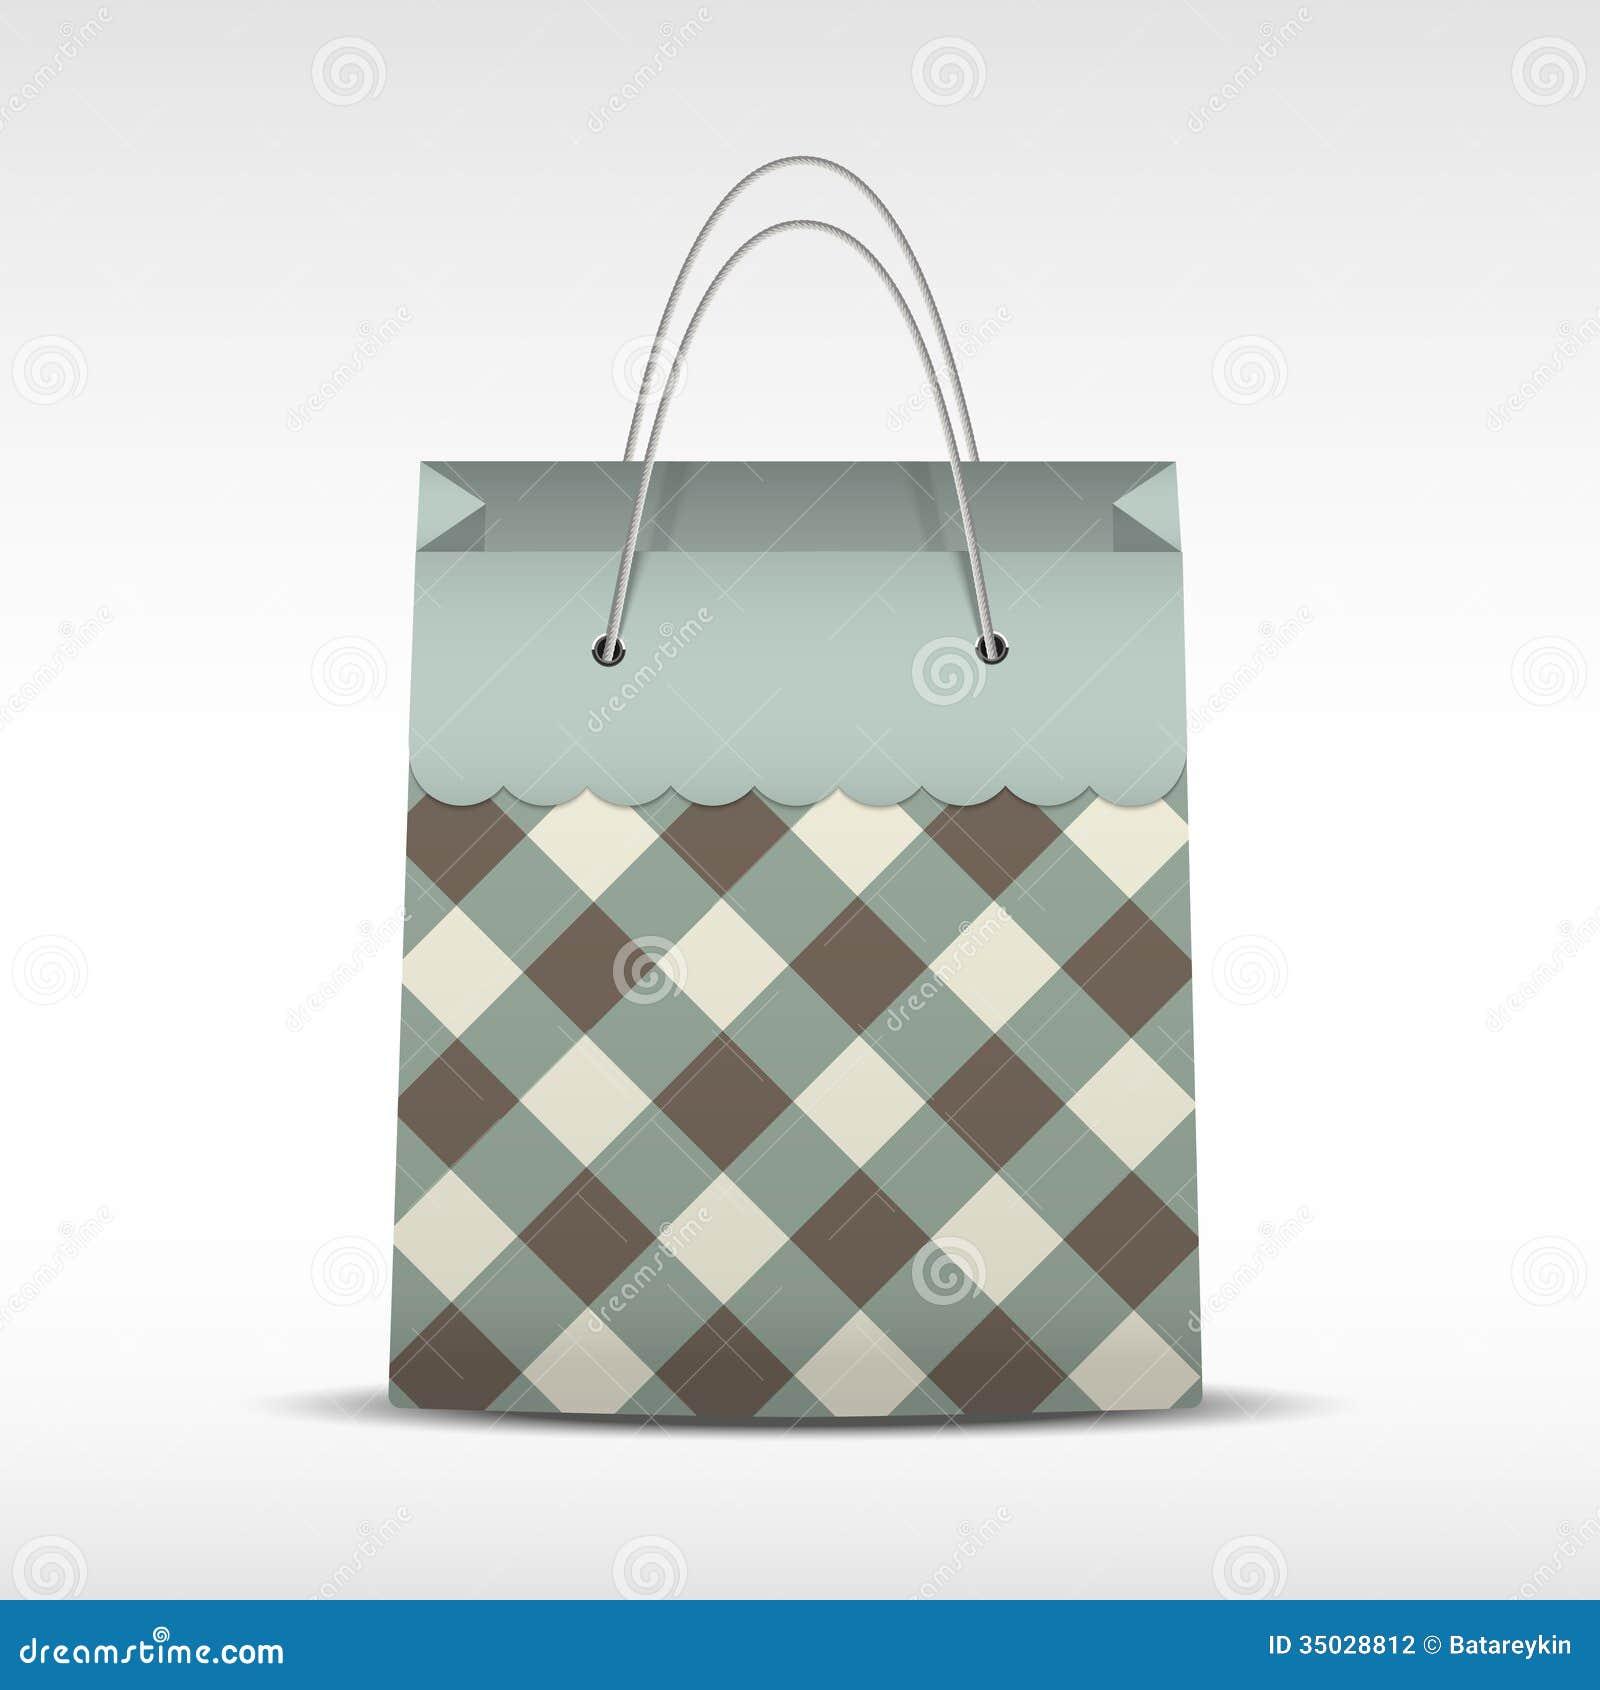 1b45a64b88 Vintage Shopping Bags